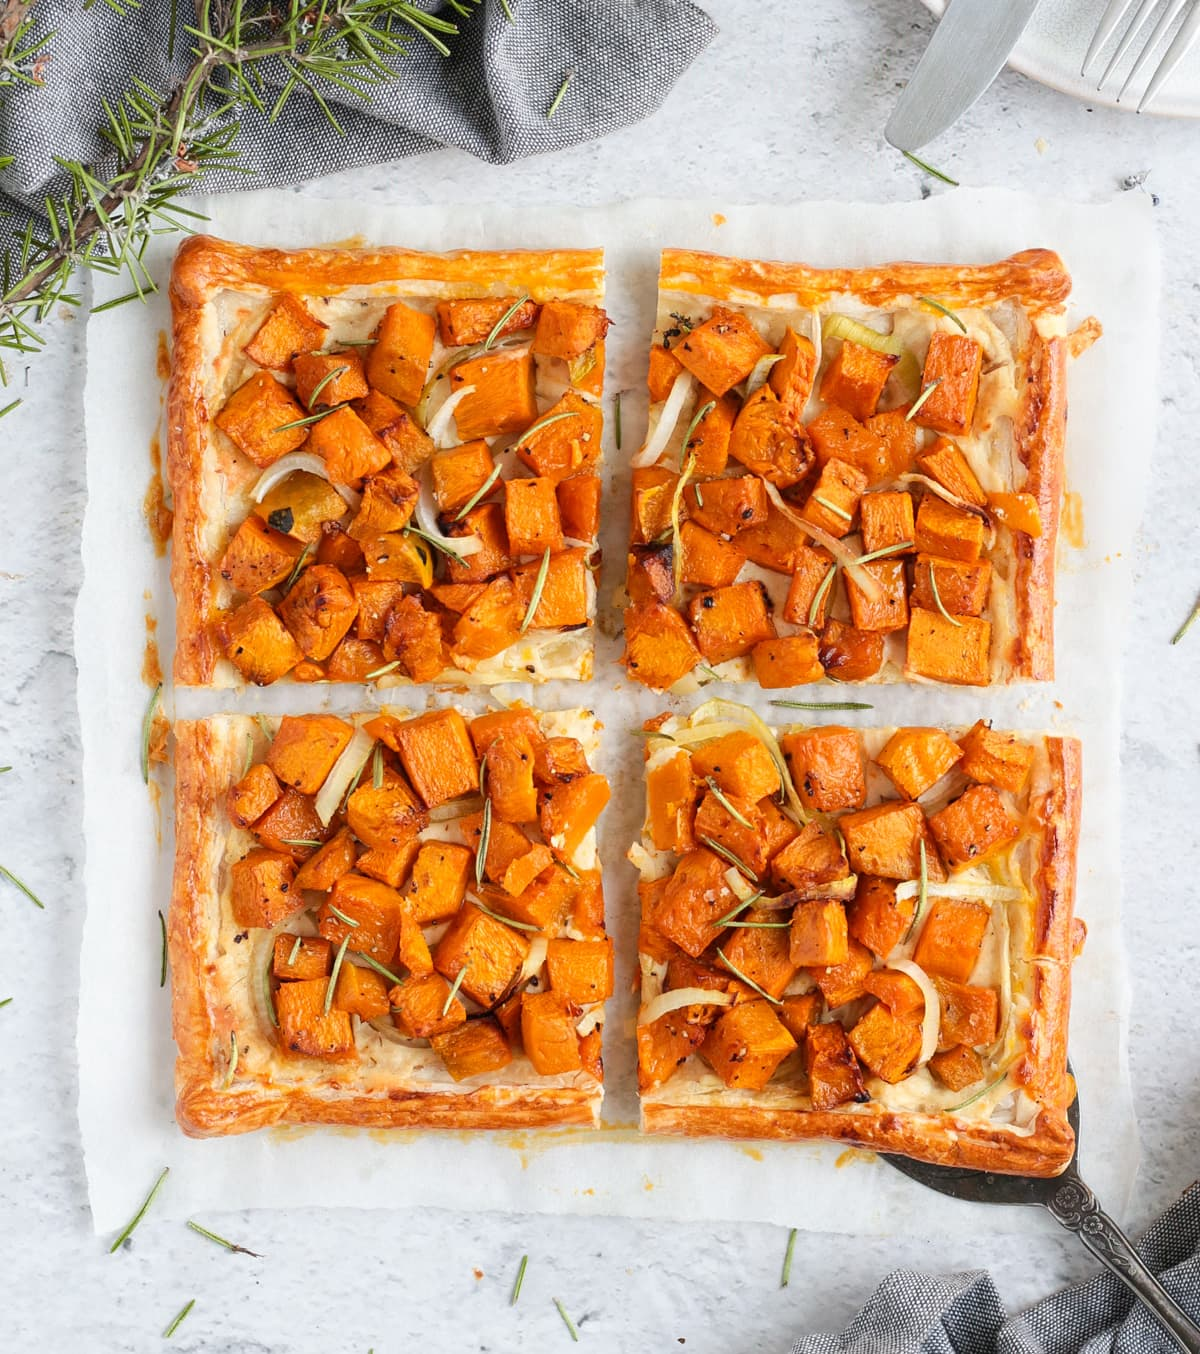 Flatlay of the pumpkin tart sliced in 4